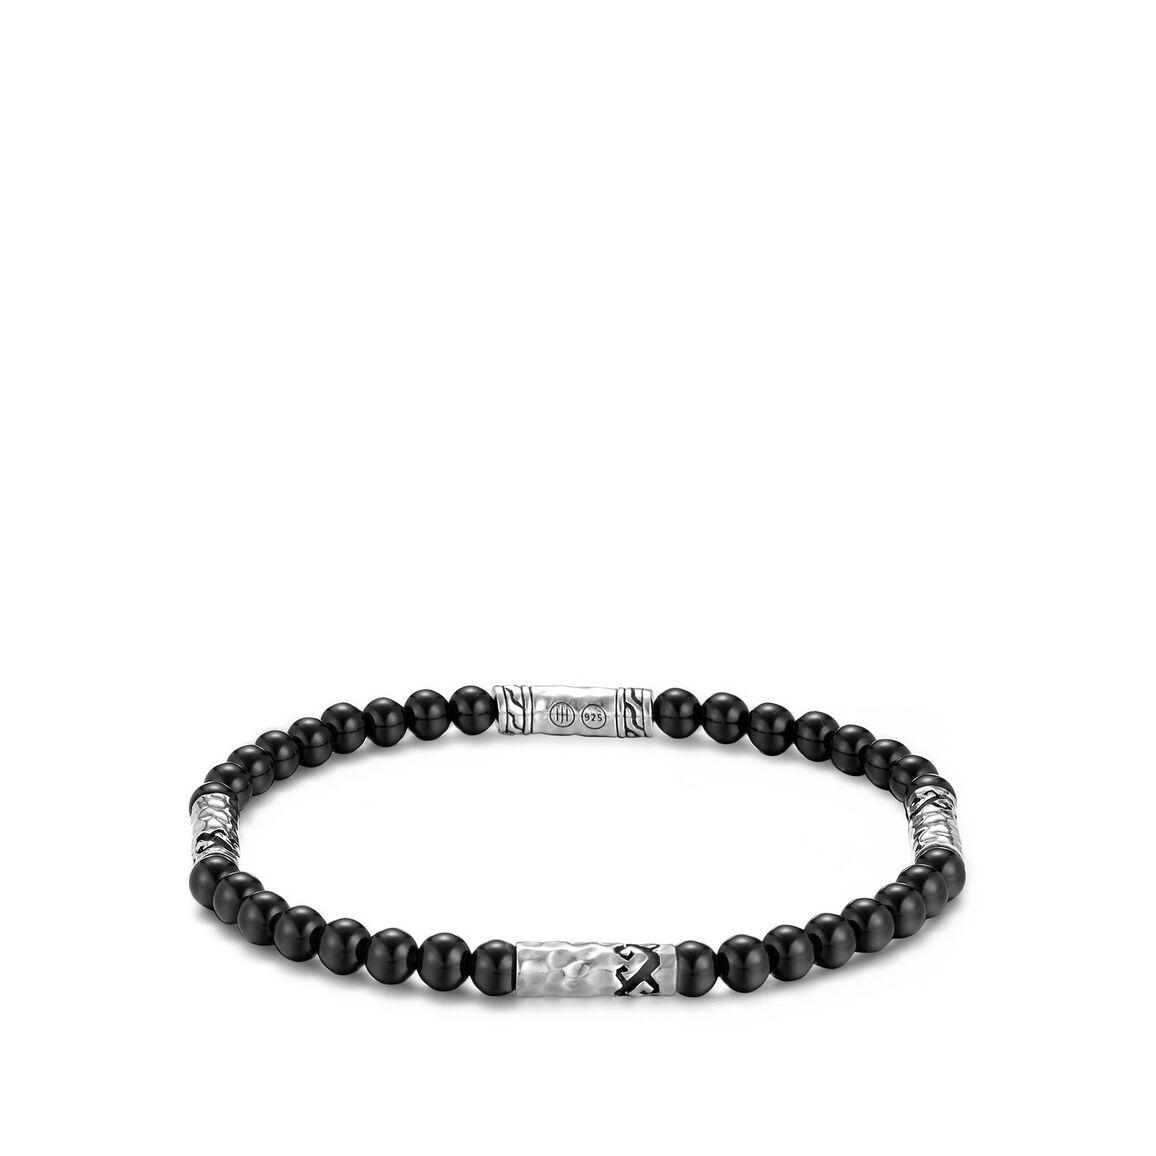 Dayak Bead Bracelet in Silver